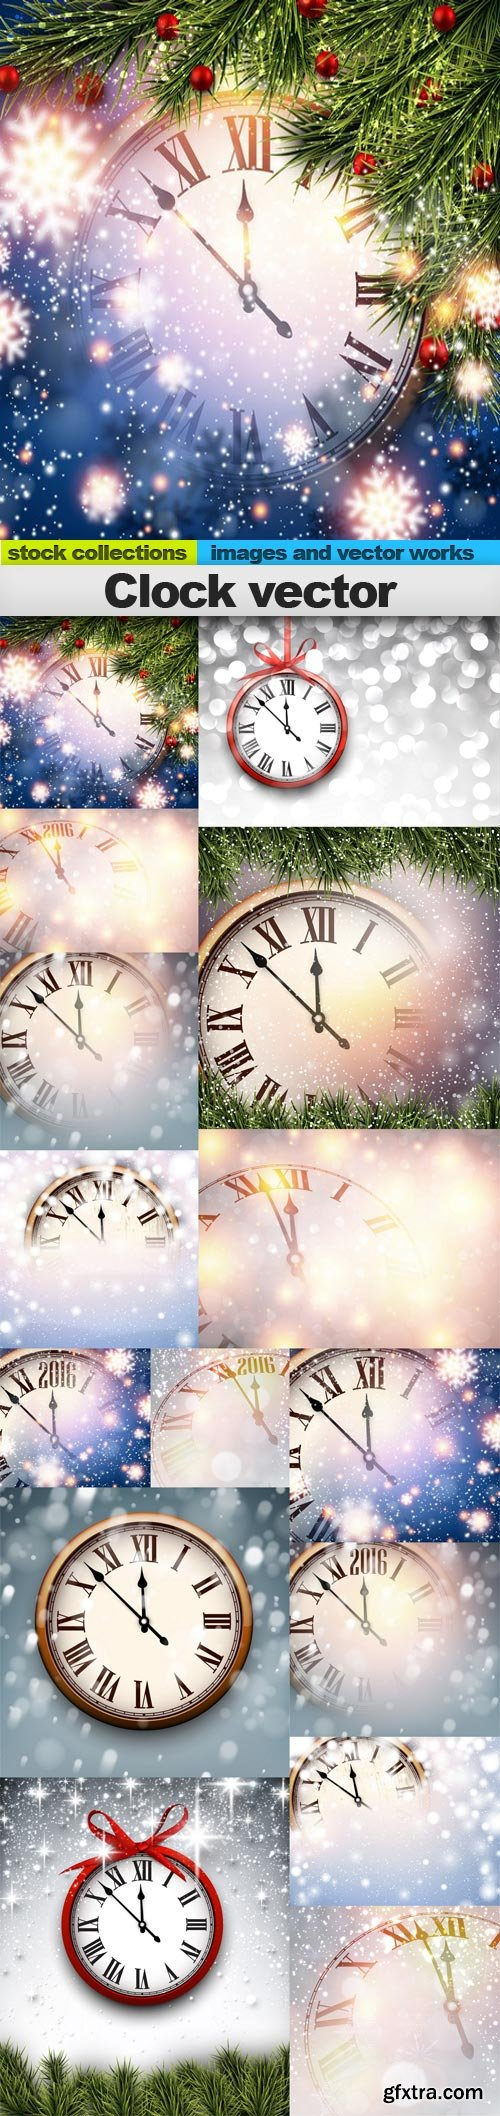 Clock vector, 15 x EPS